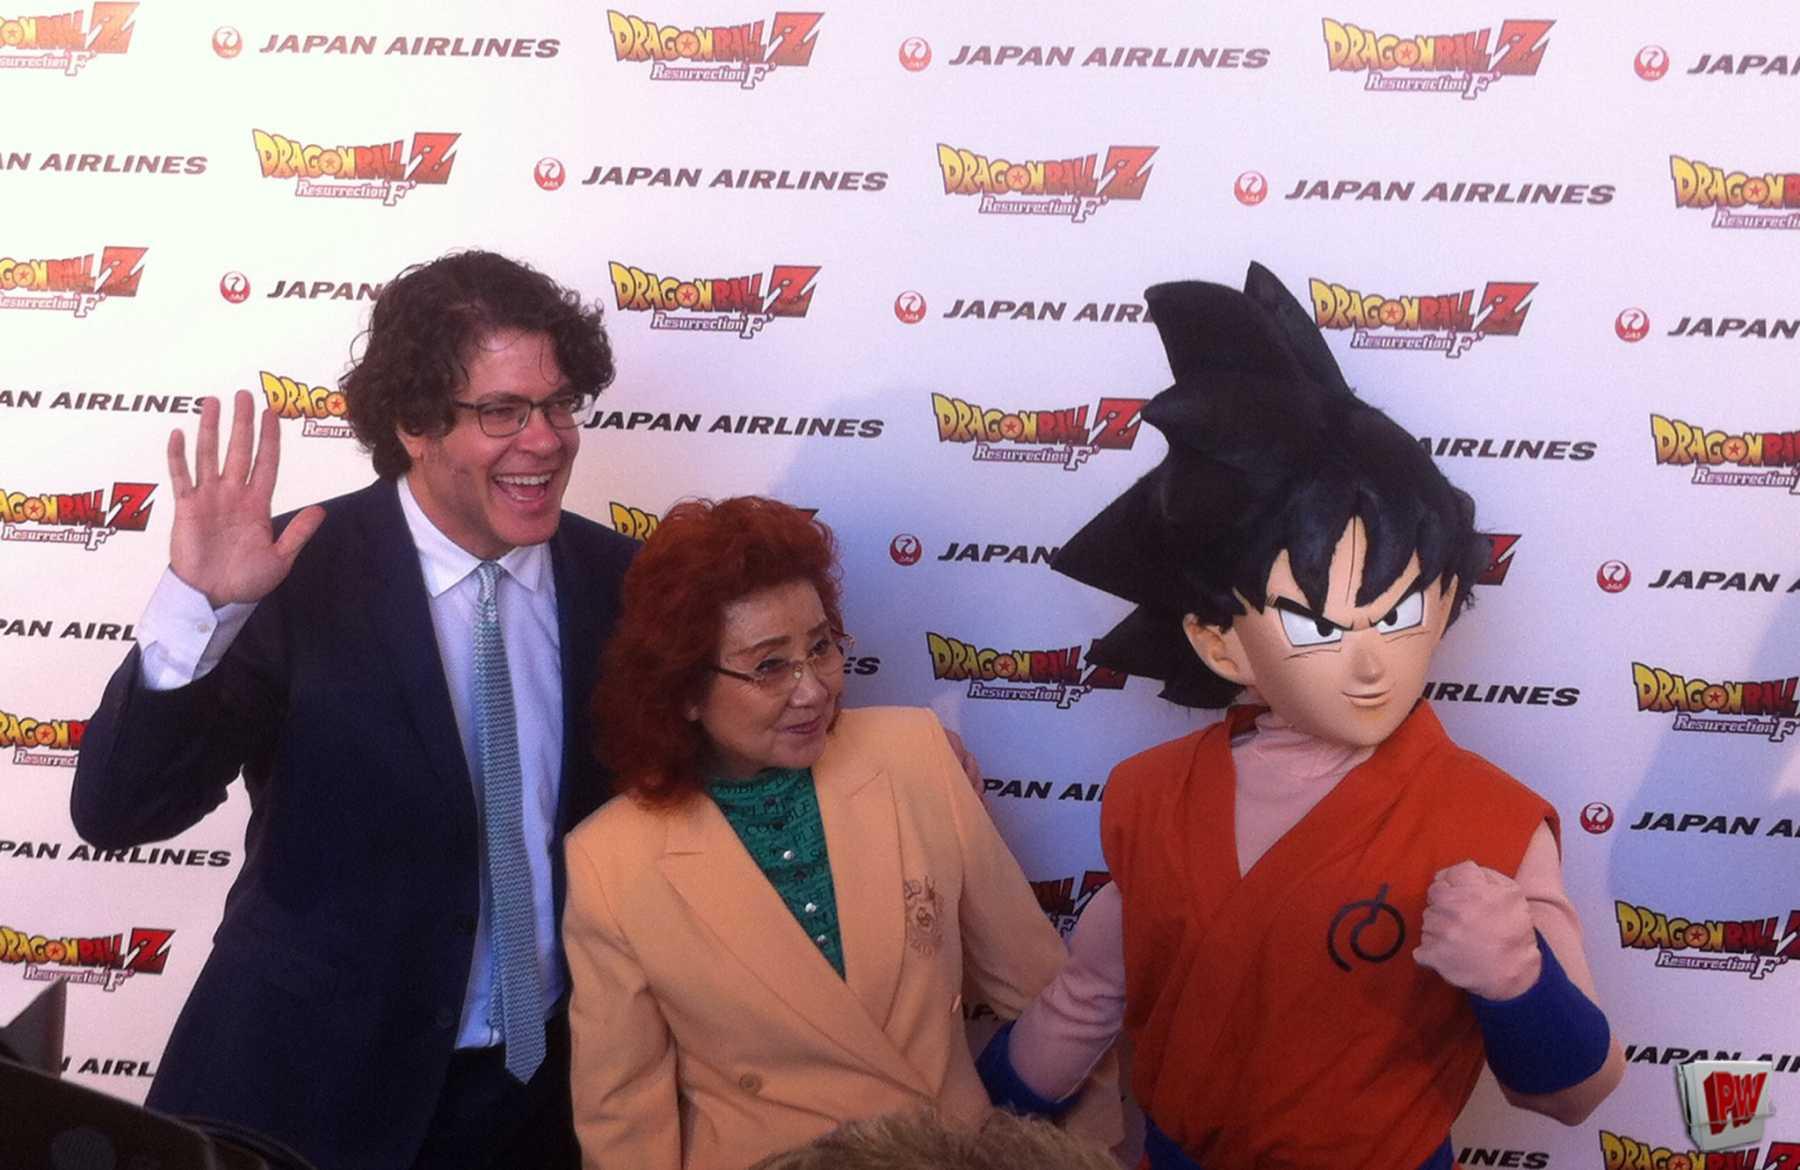 PopWrapped Attends The Premiere Of Dragon Ball Z: Resurrection 'F' | Dragon Ball Z